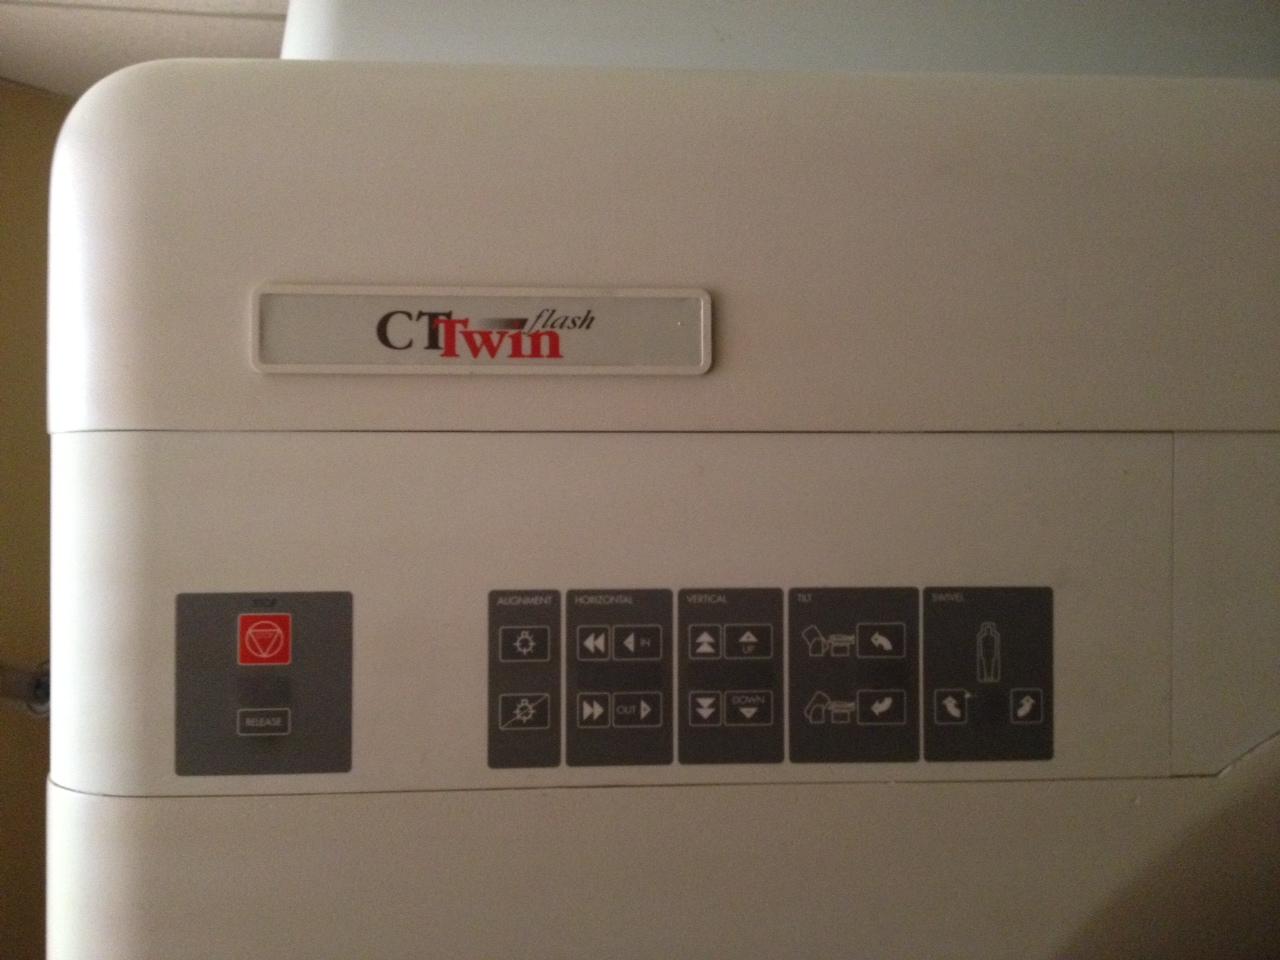 Elscint CT Flash Twin